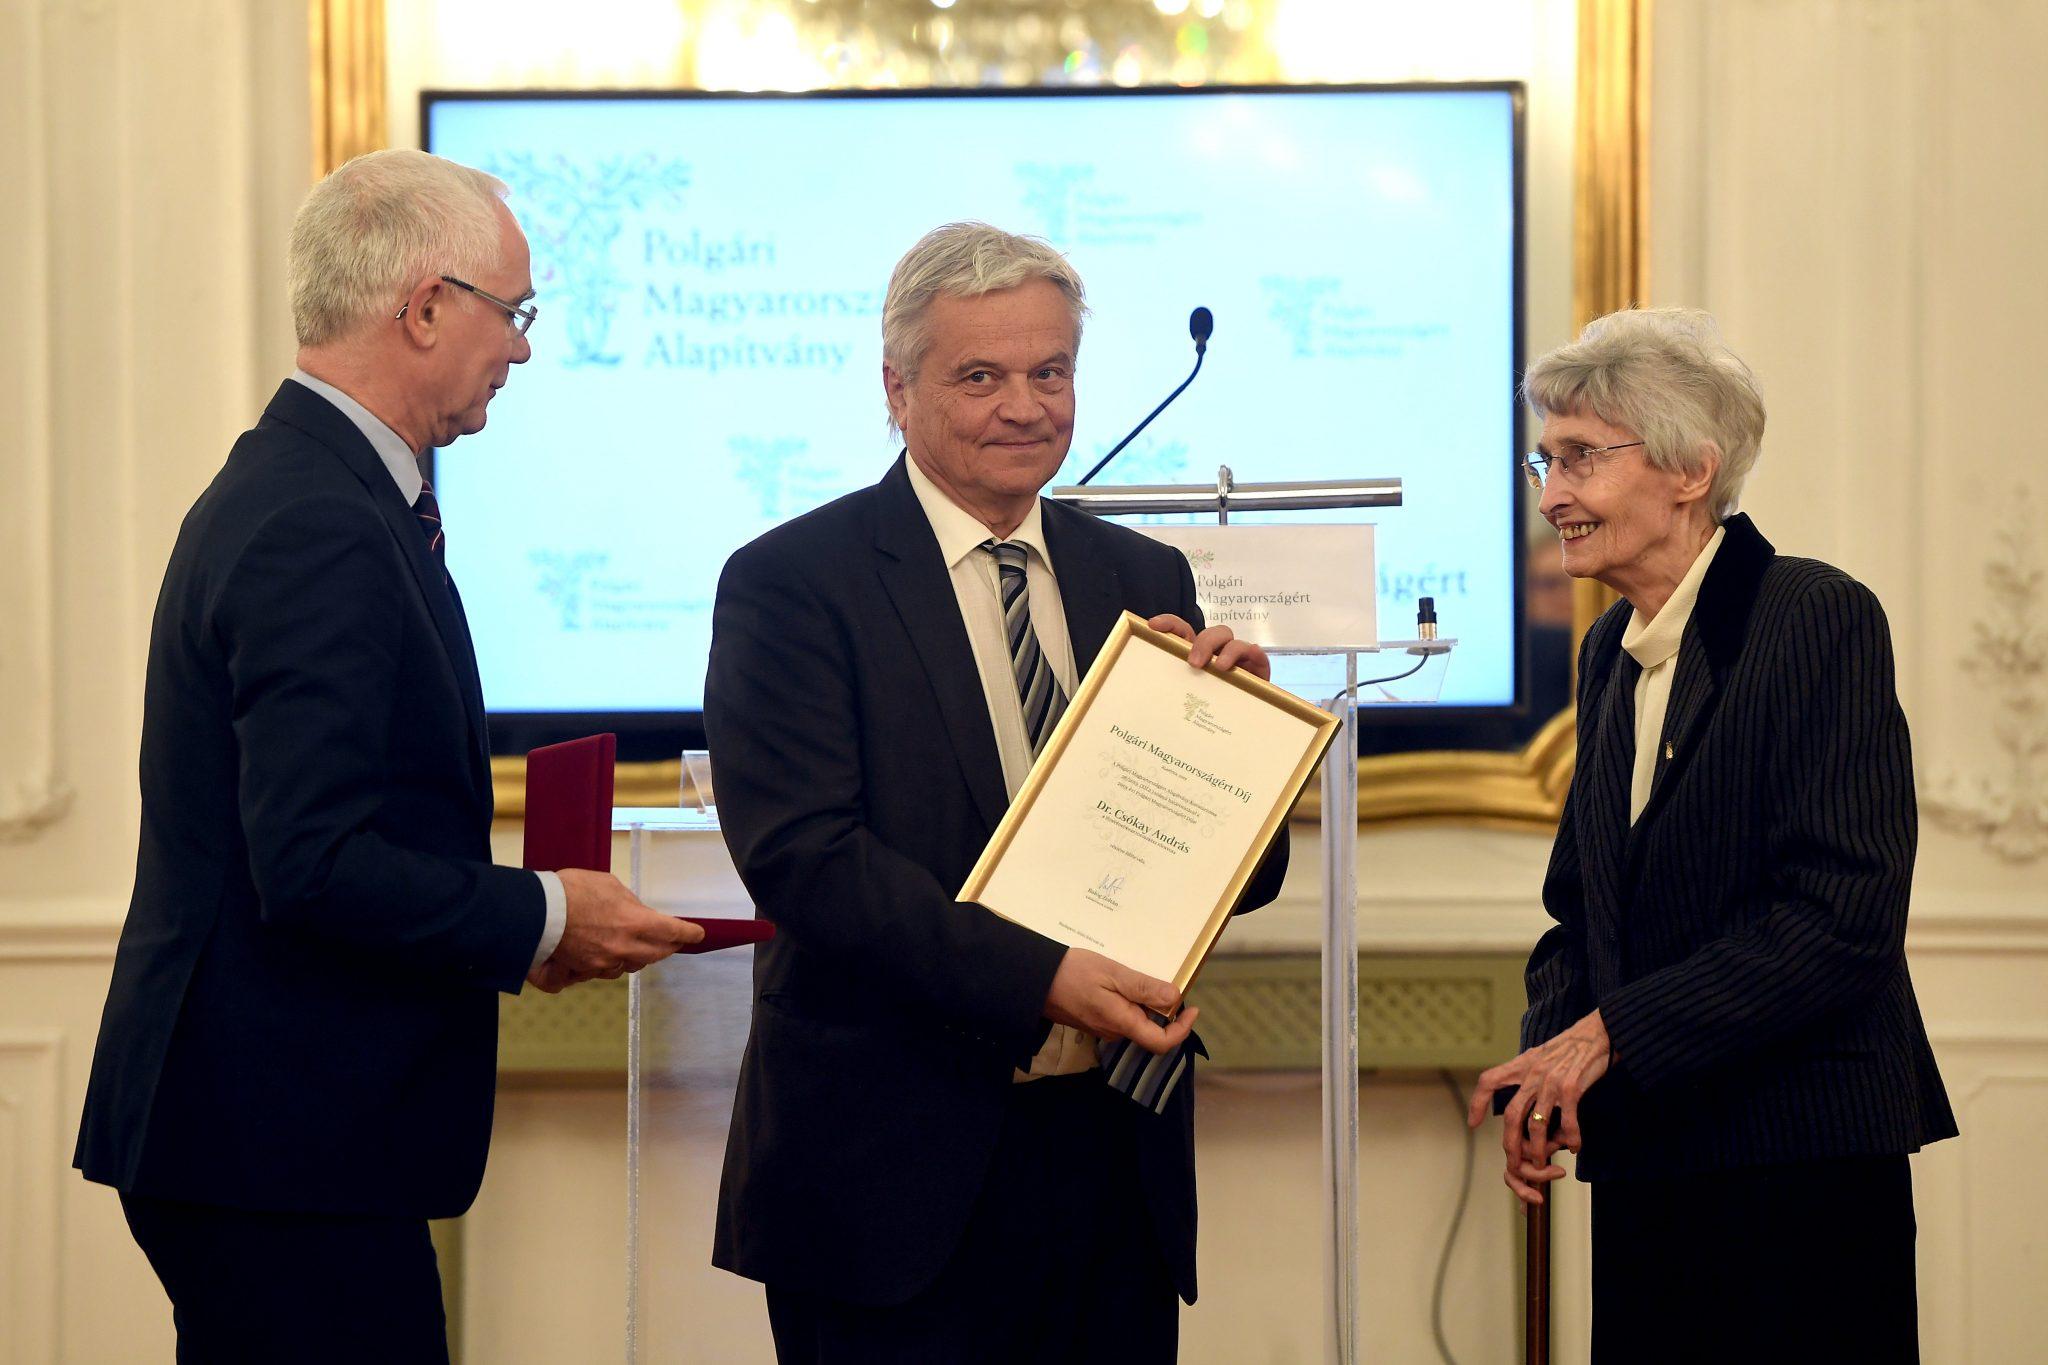 András Csókay Neurosurgeon Receives Award for Civic Hungary